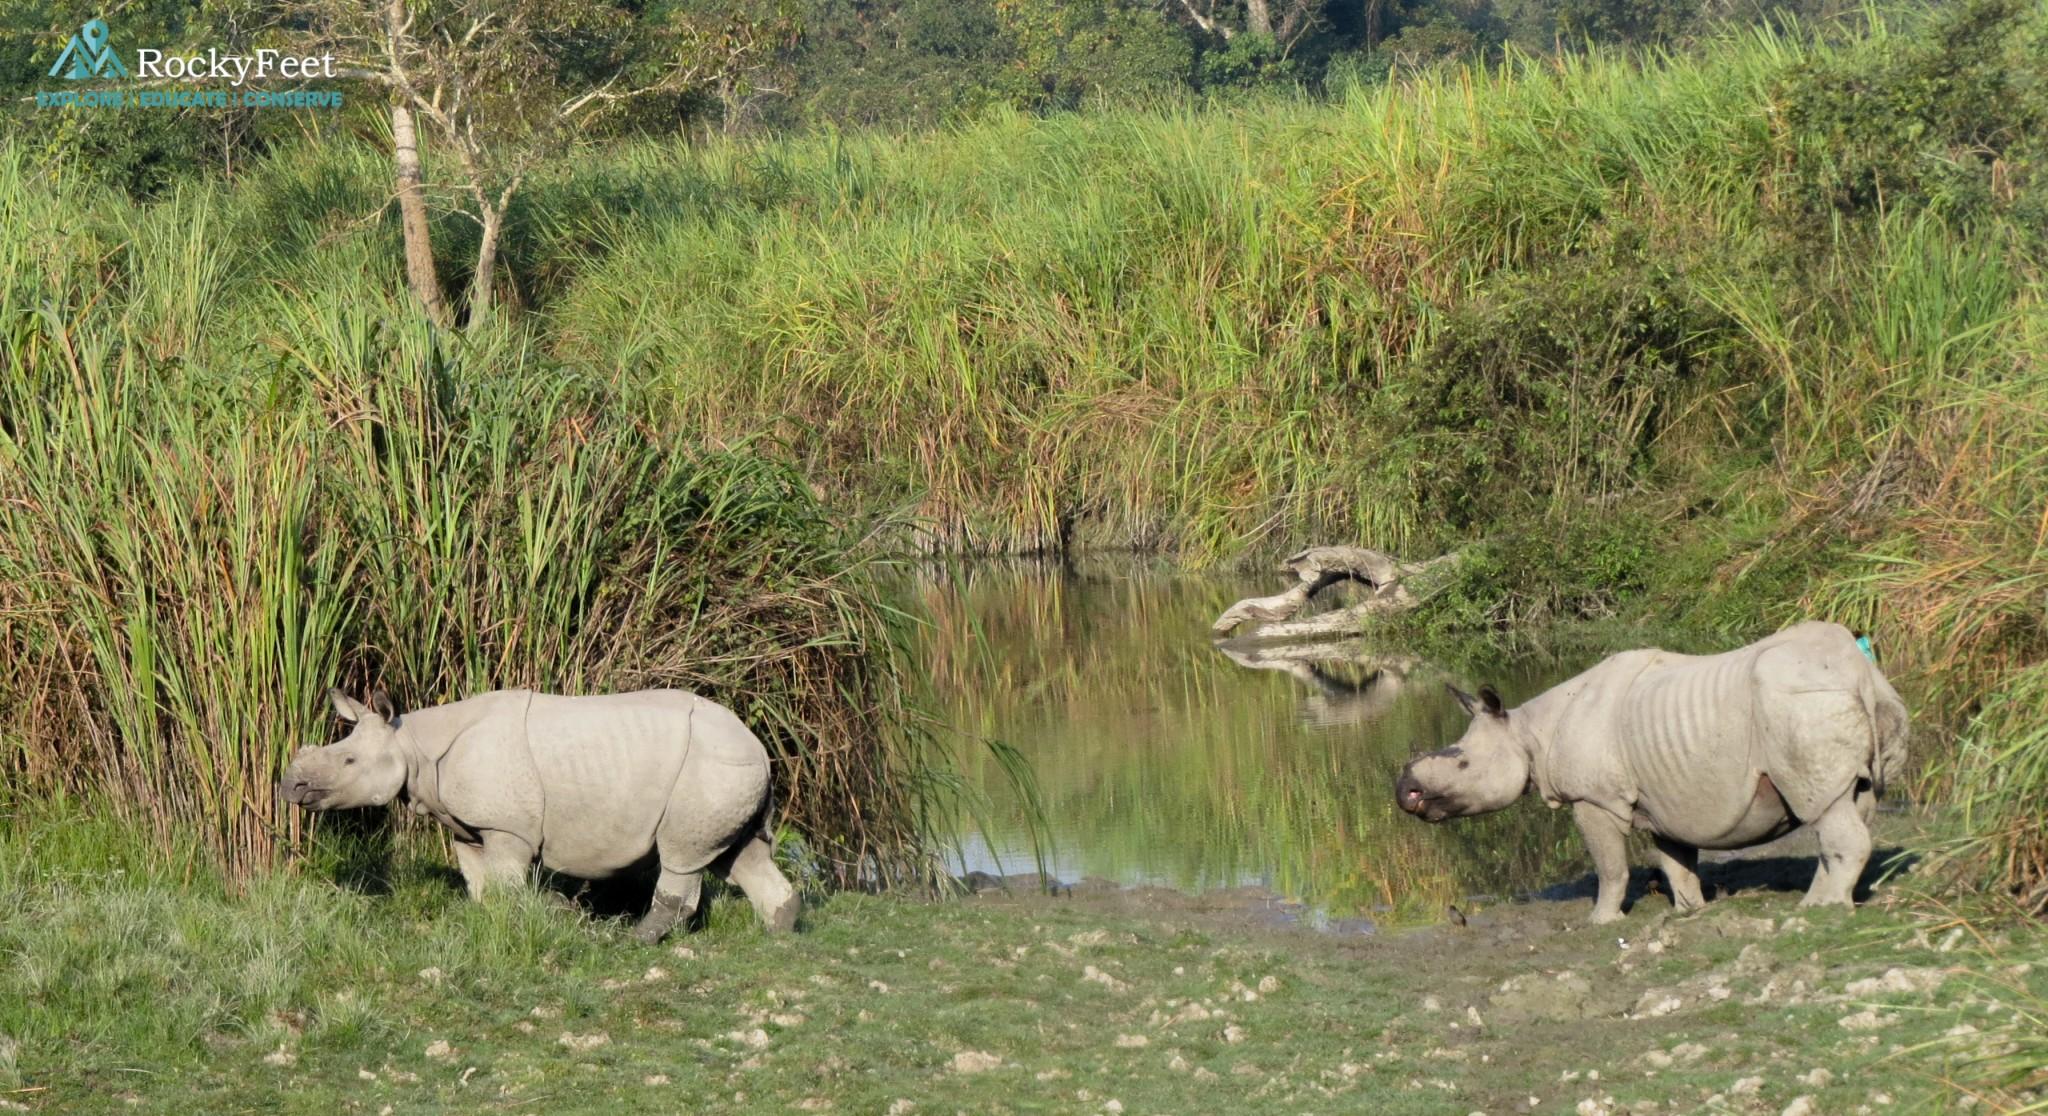 Rhinos grazing in the central range - Jan 2018